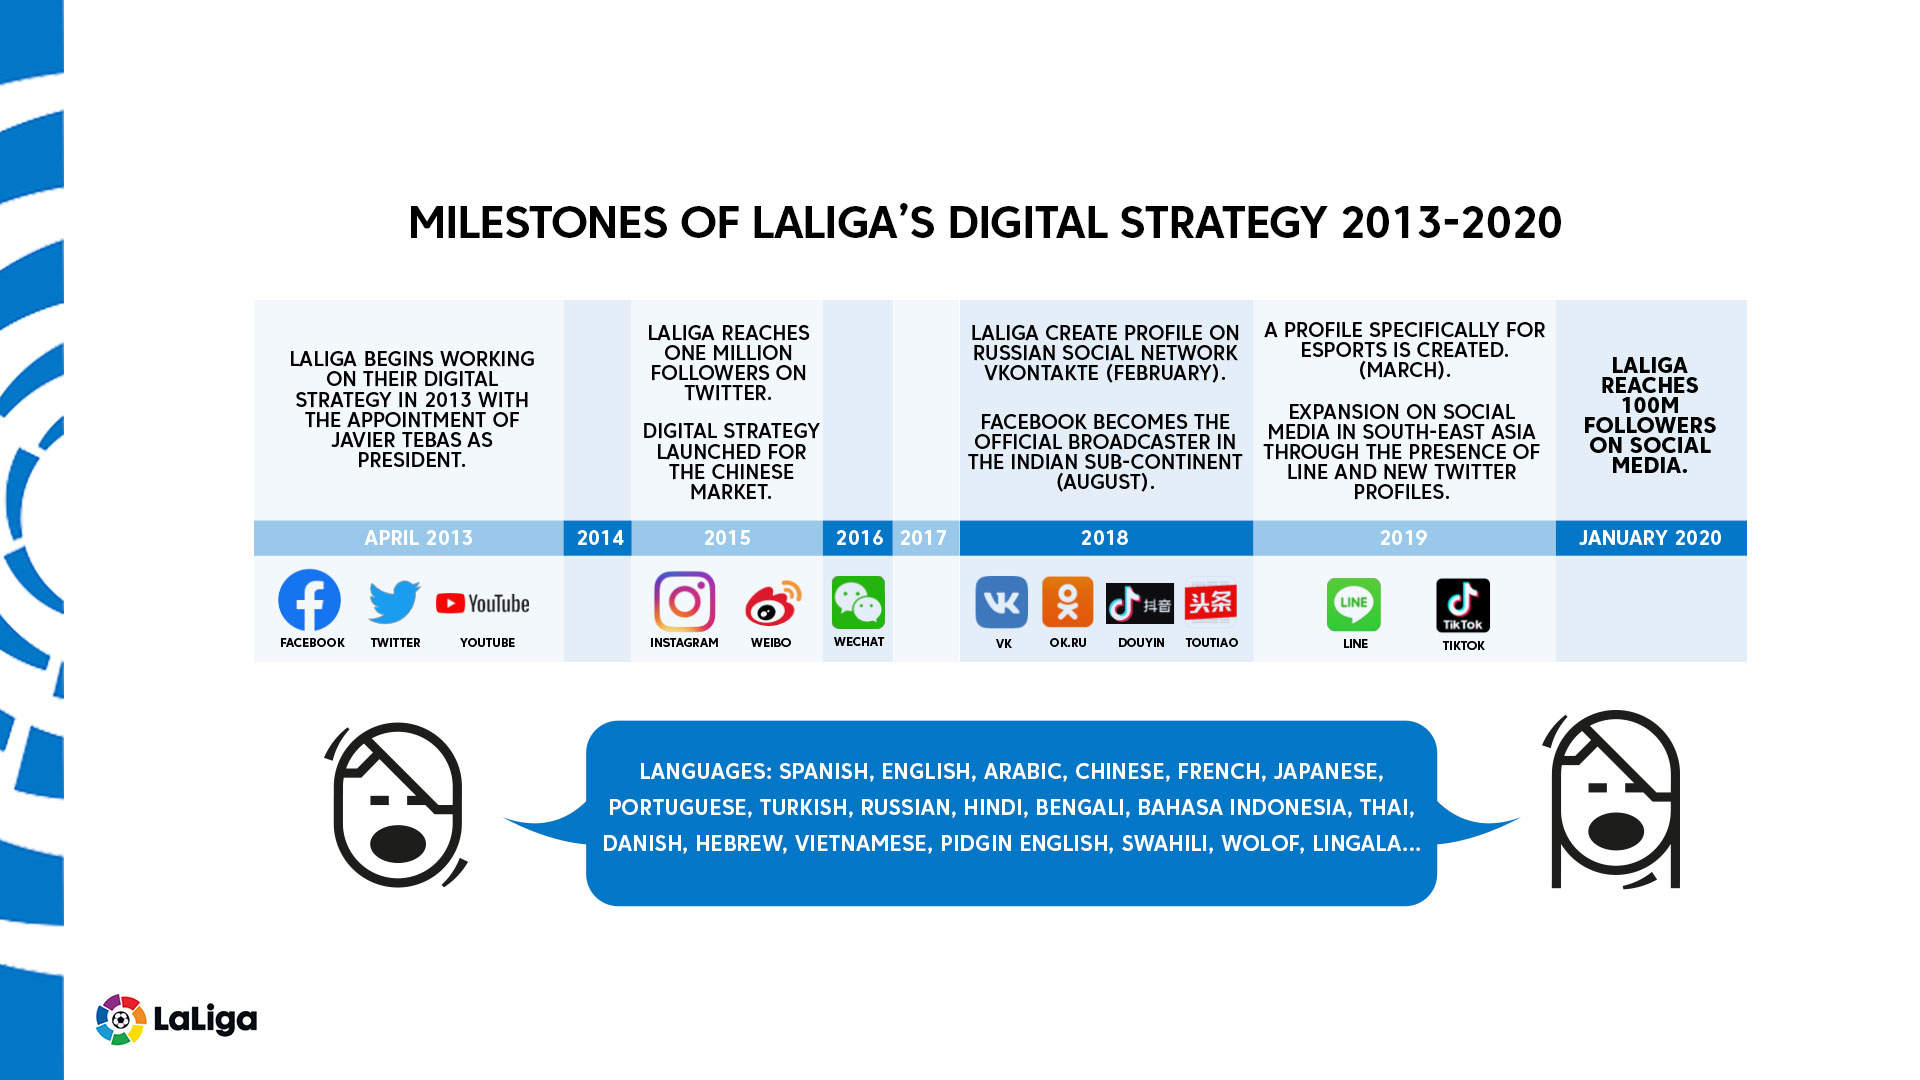 LaLiga surpasses 100 million followers on social media - Brand Spur